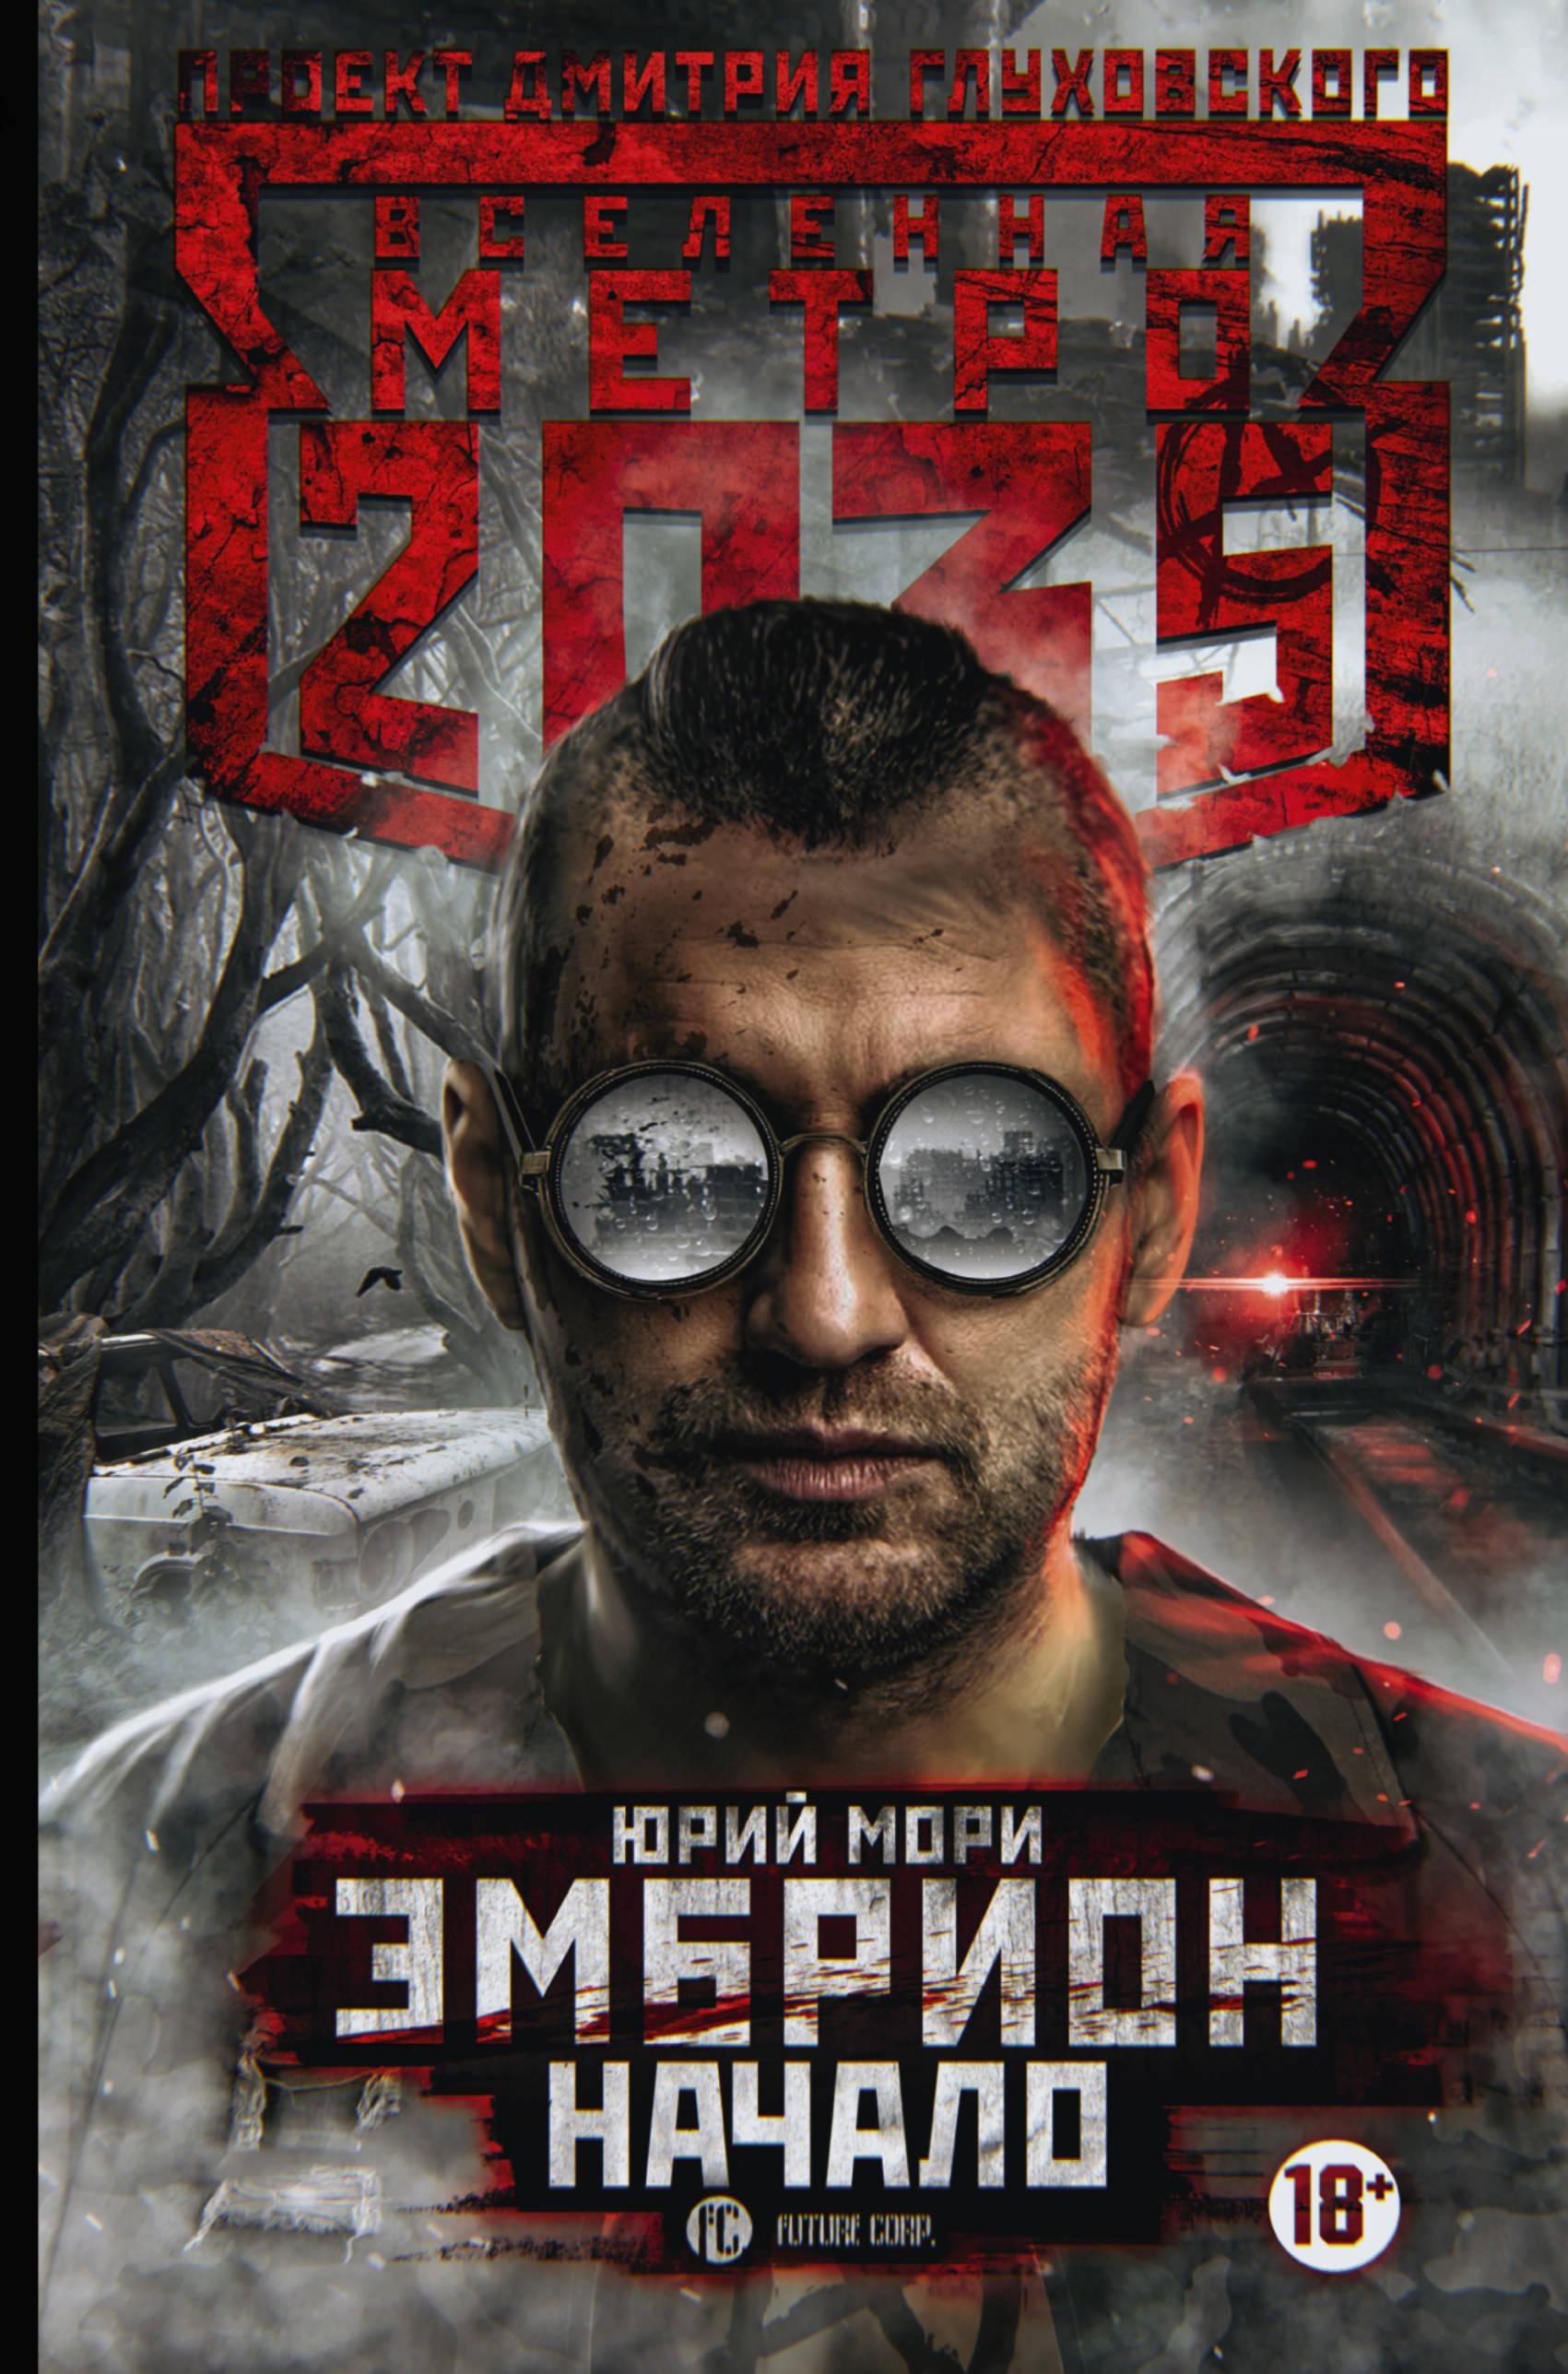 Юрий Мори. Метро 2035: Эмбрион. Начало